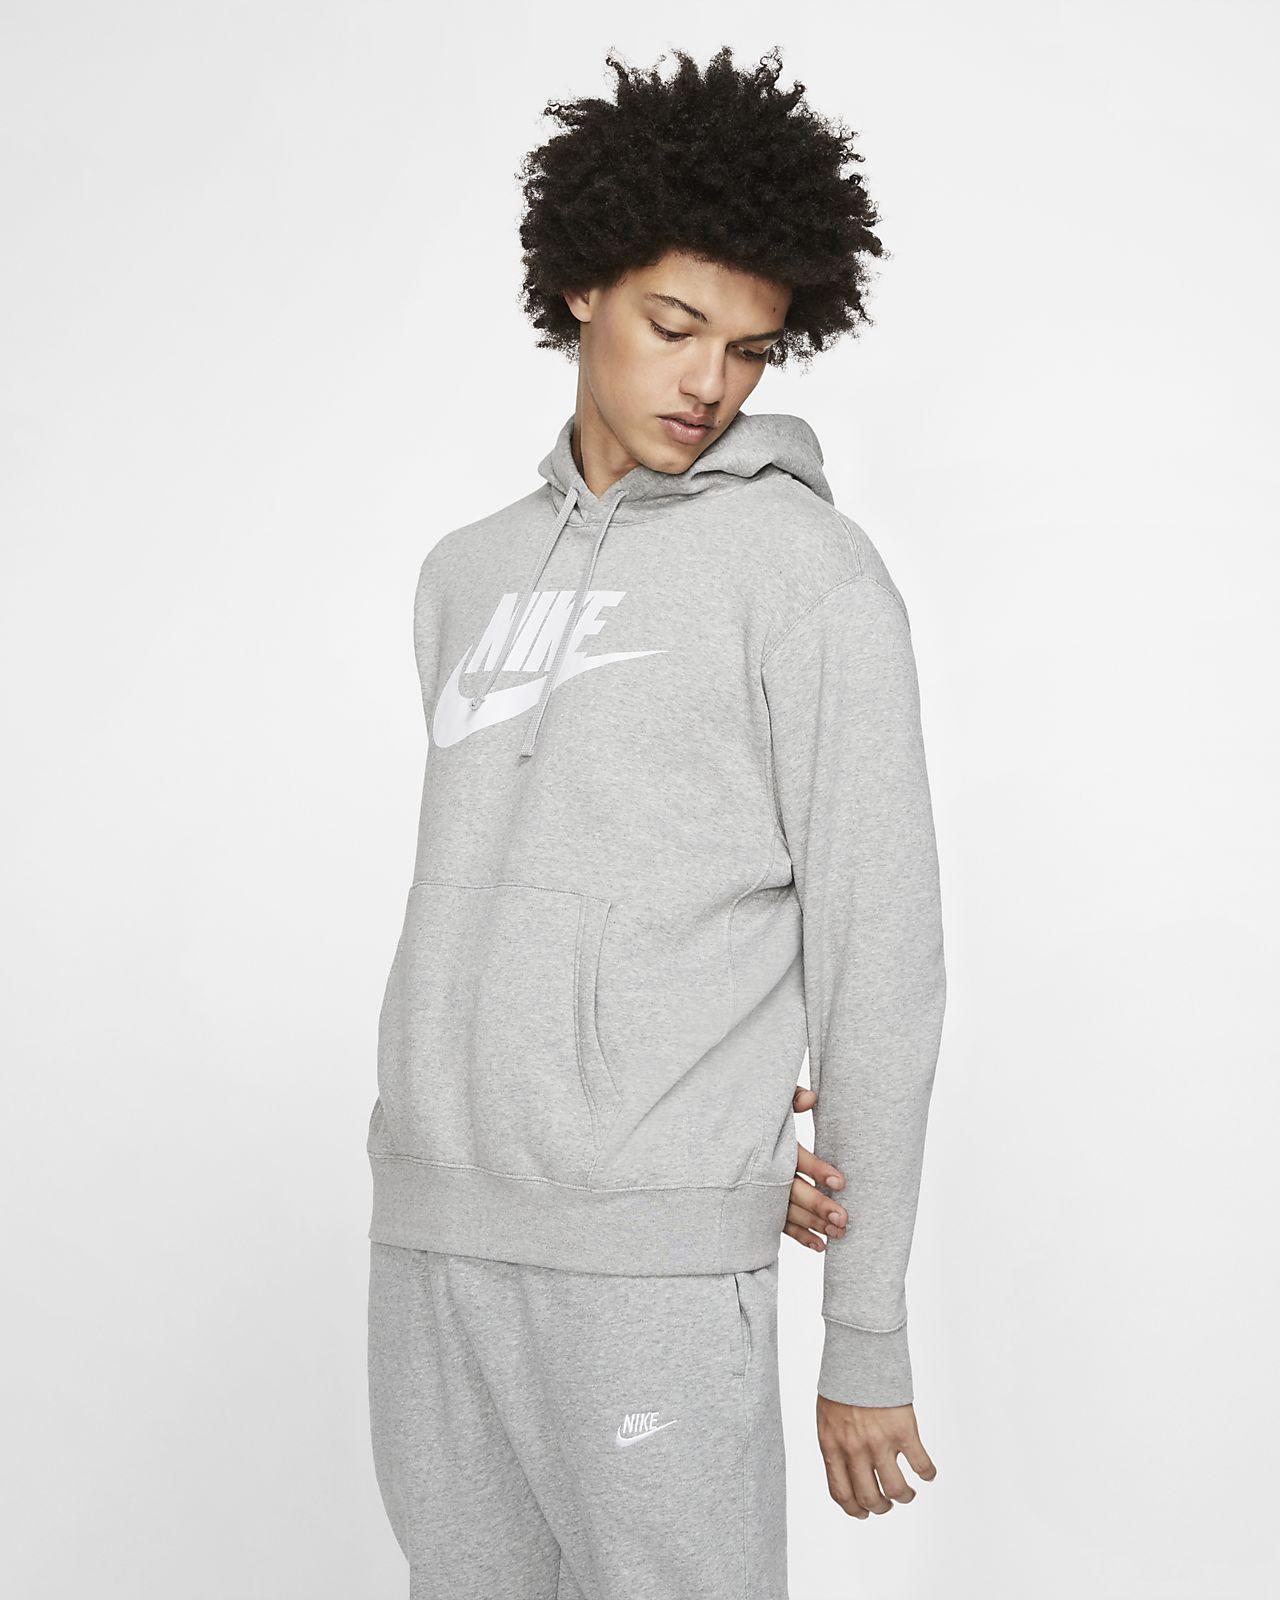 cdcb212ce05fc3 Nike Sportswear Club Fleece Herren-Hoodie mit Grafik. Nike.com BE